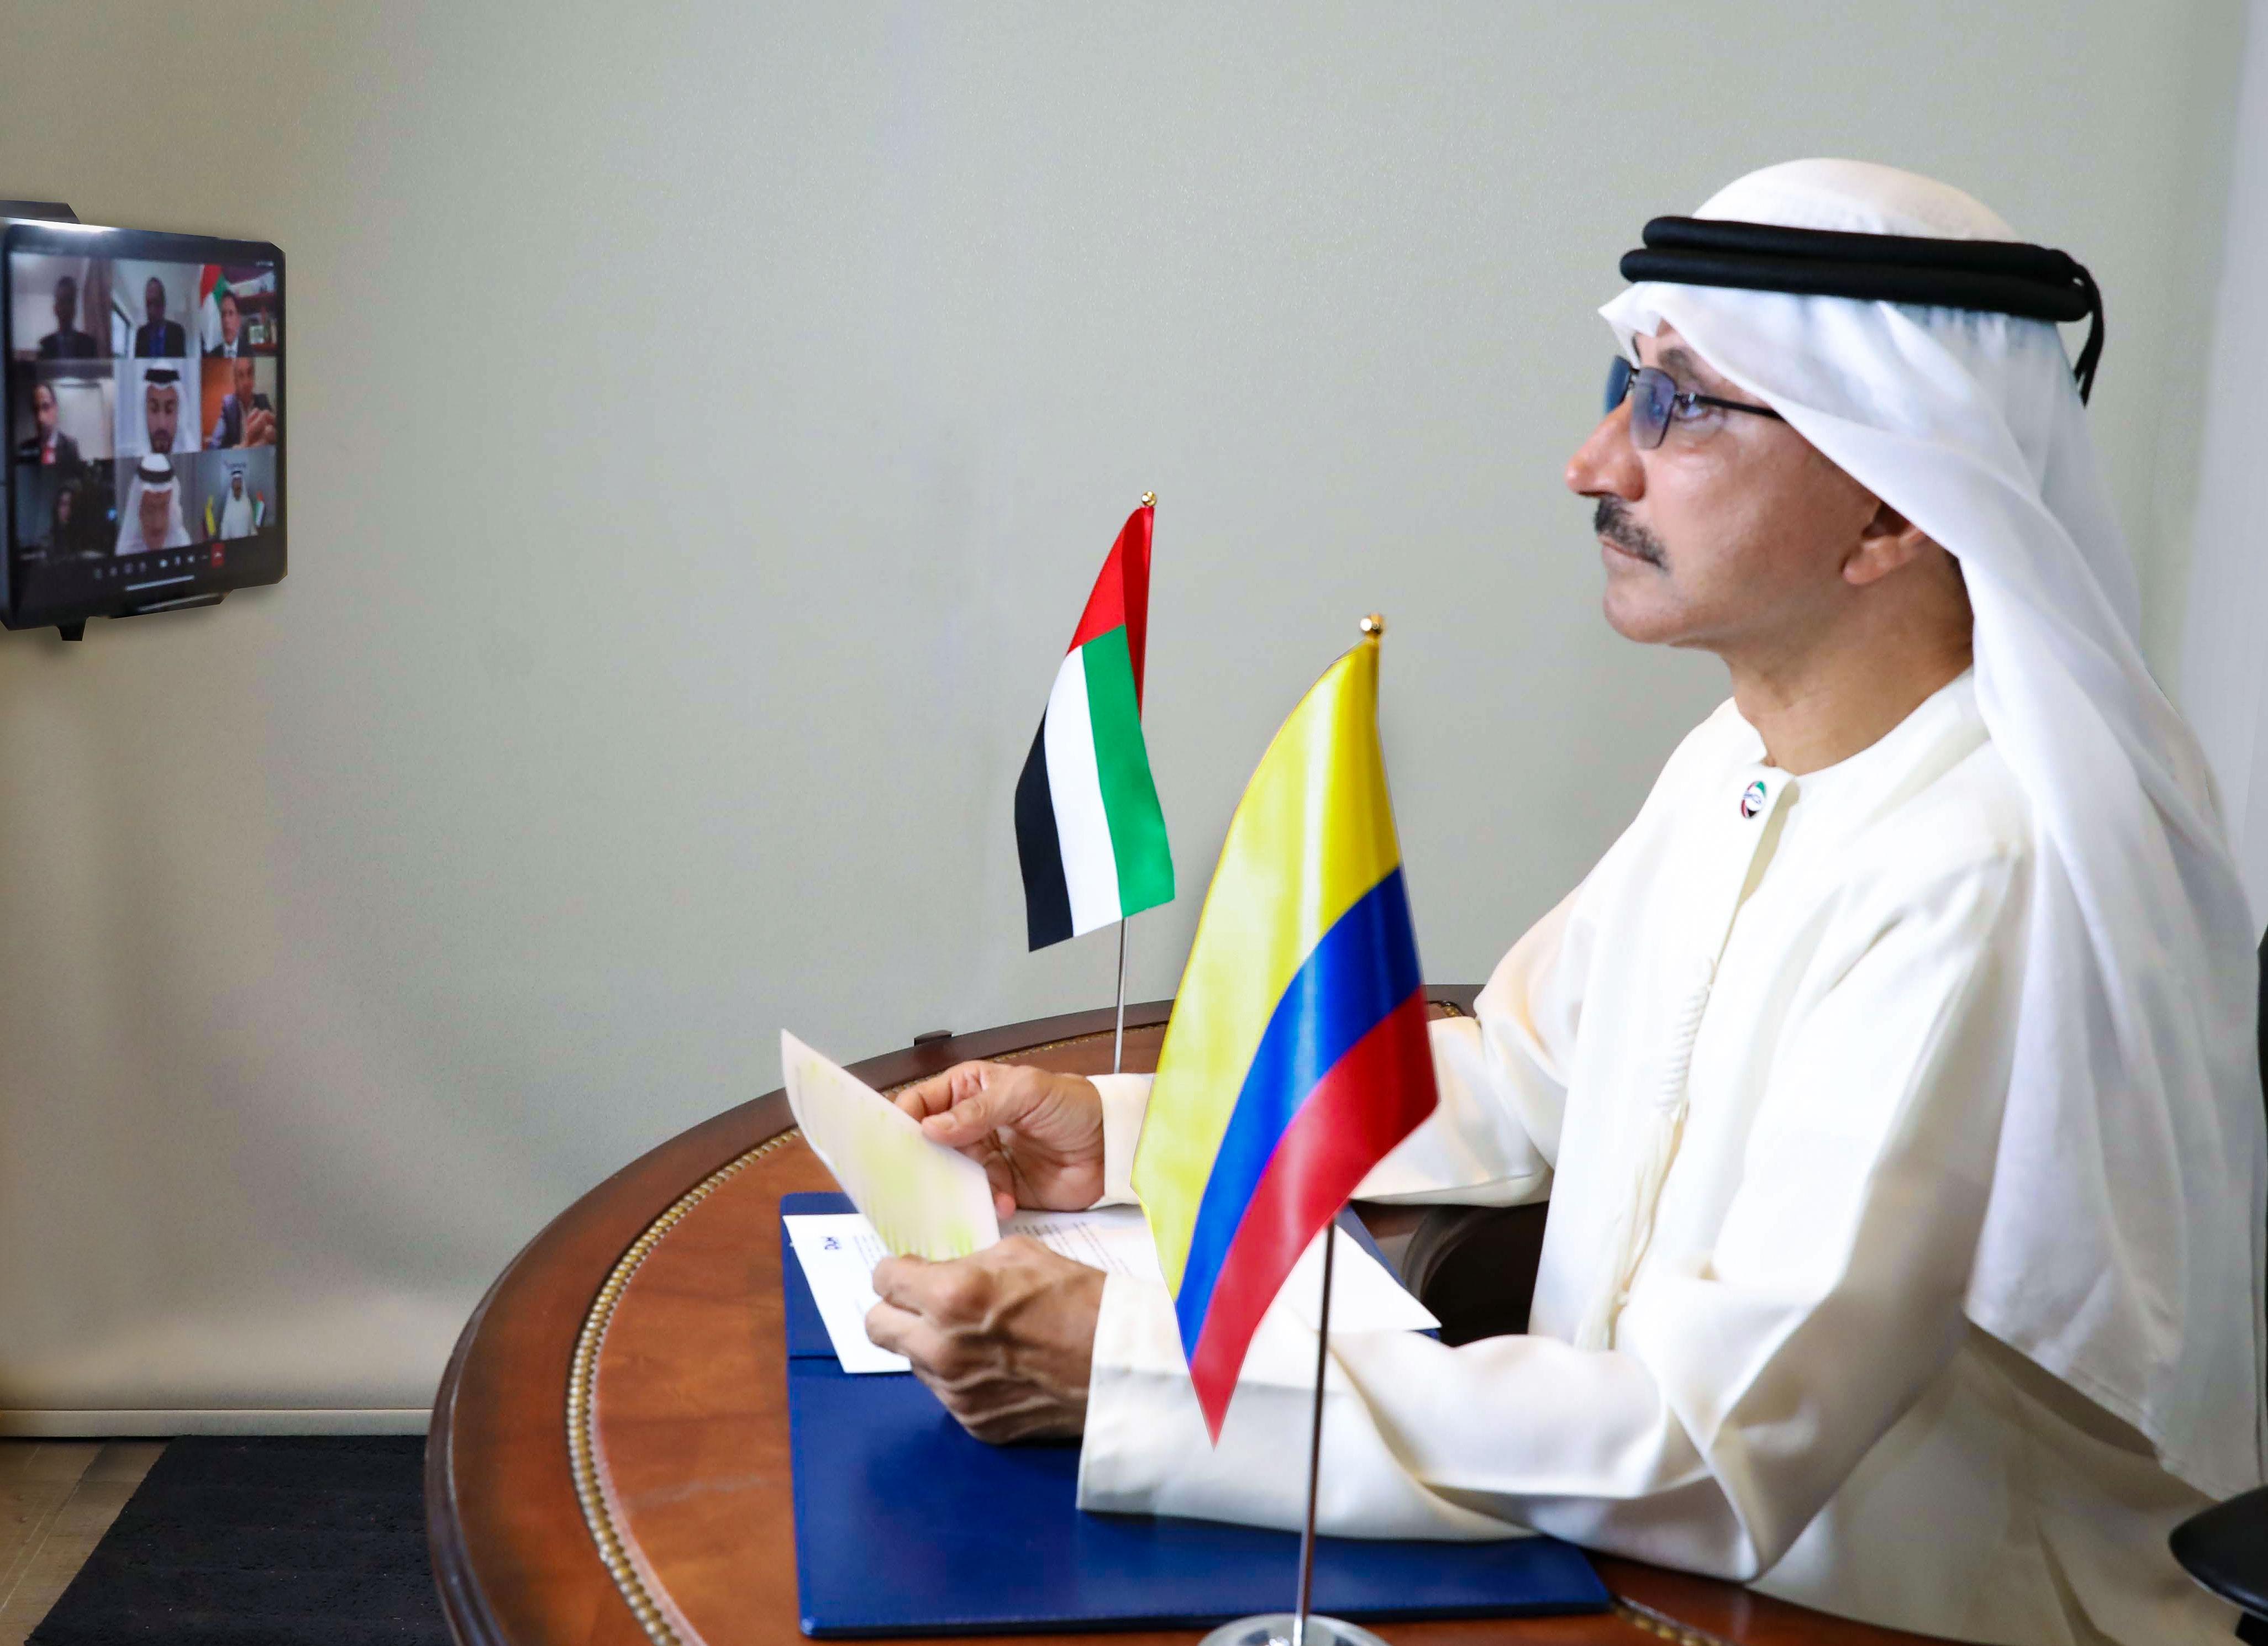 he sultan bin sulayem (photo-2)